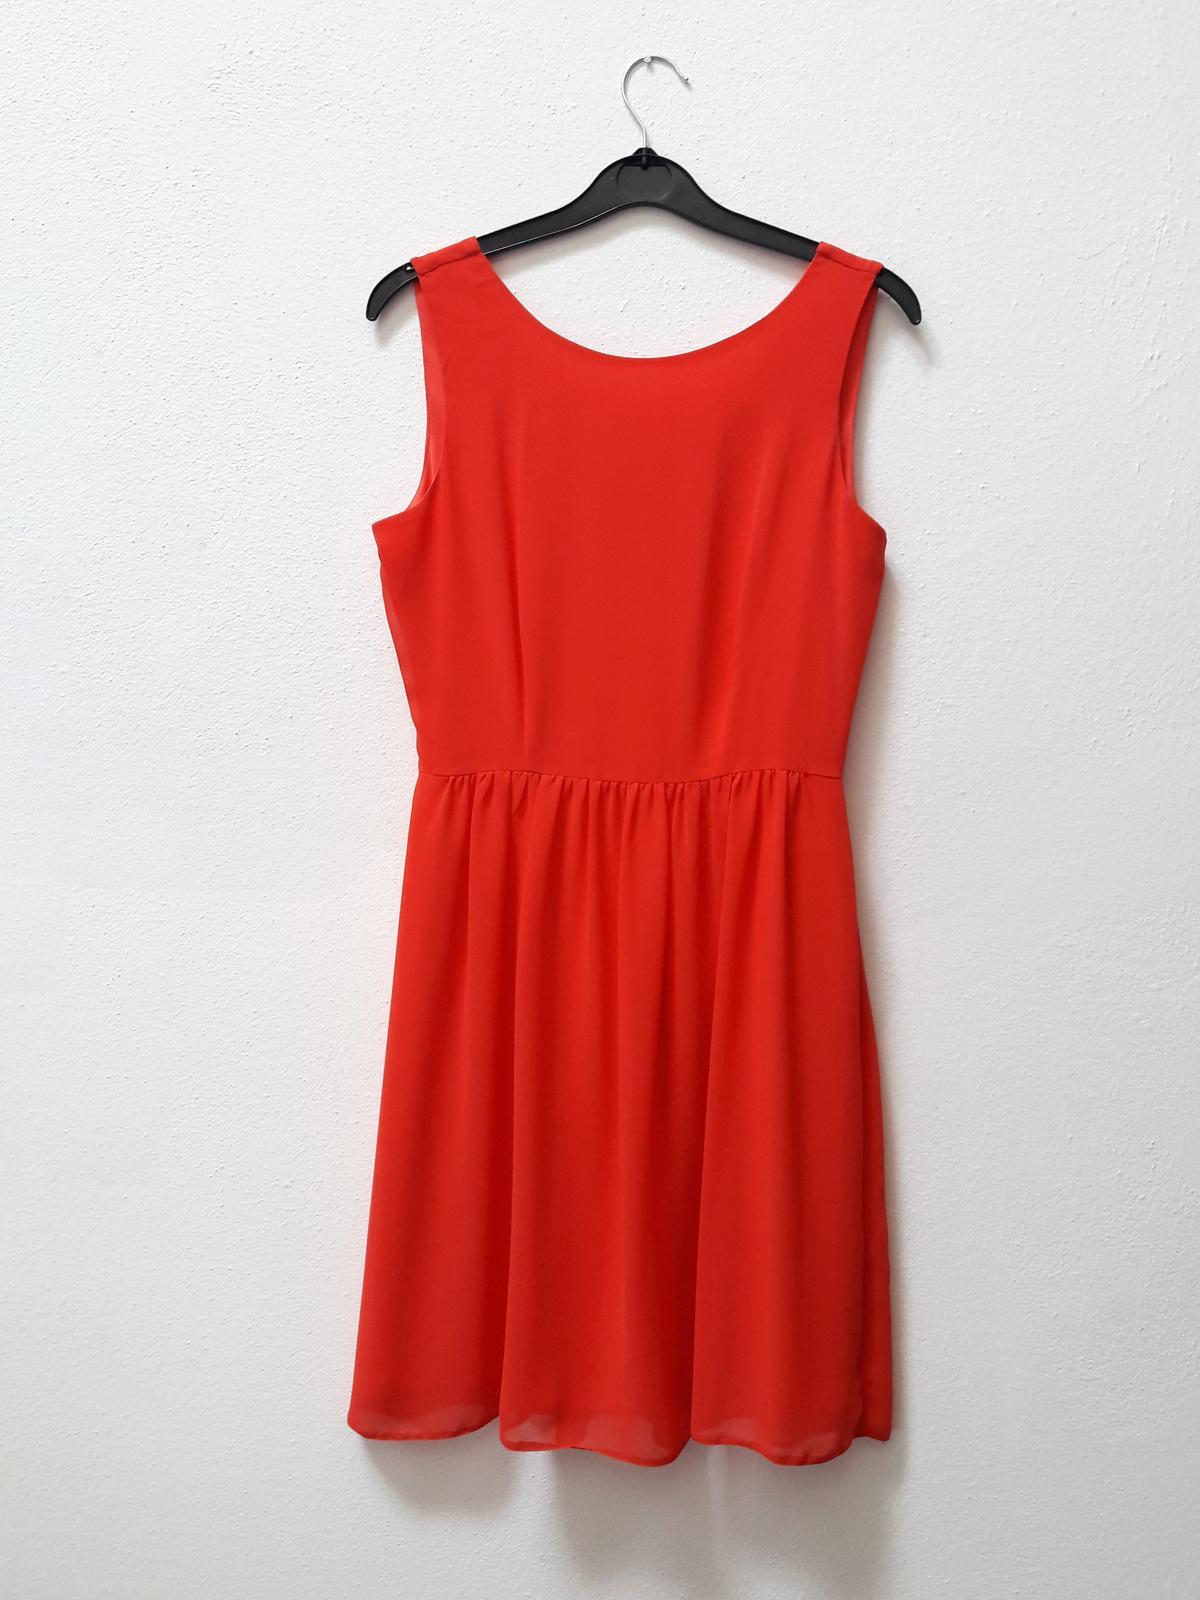 Krátke šaty, v.38 - Obrázok č. 1